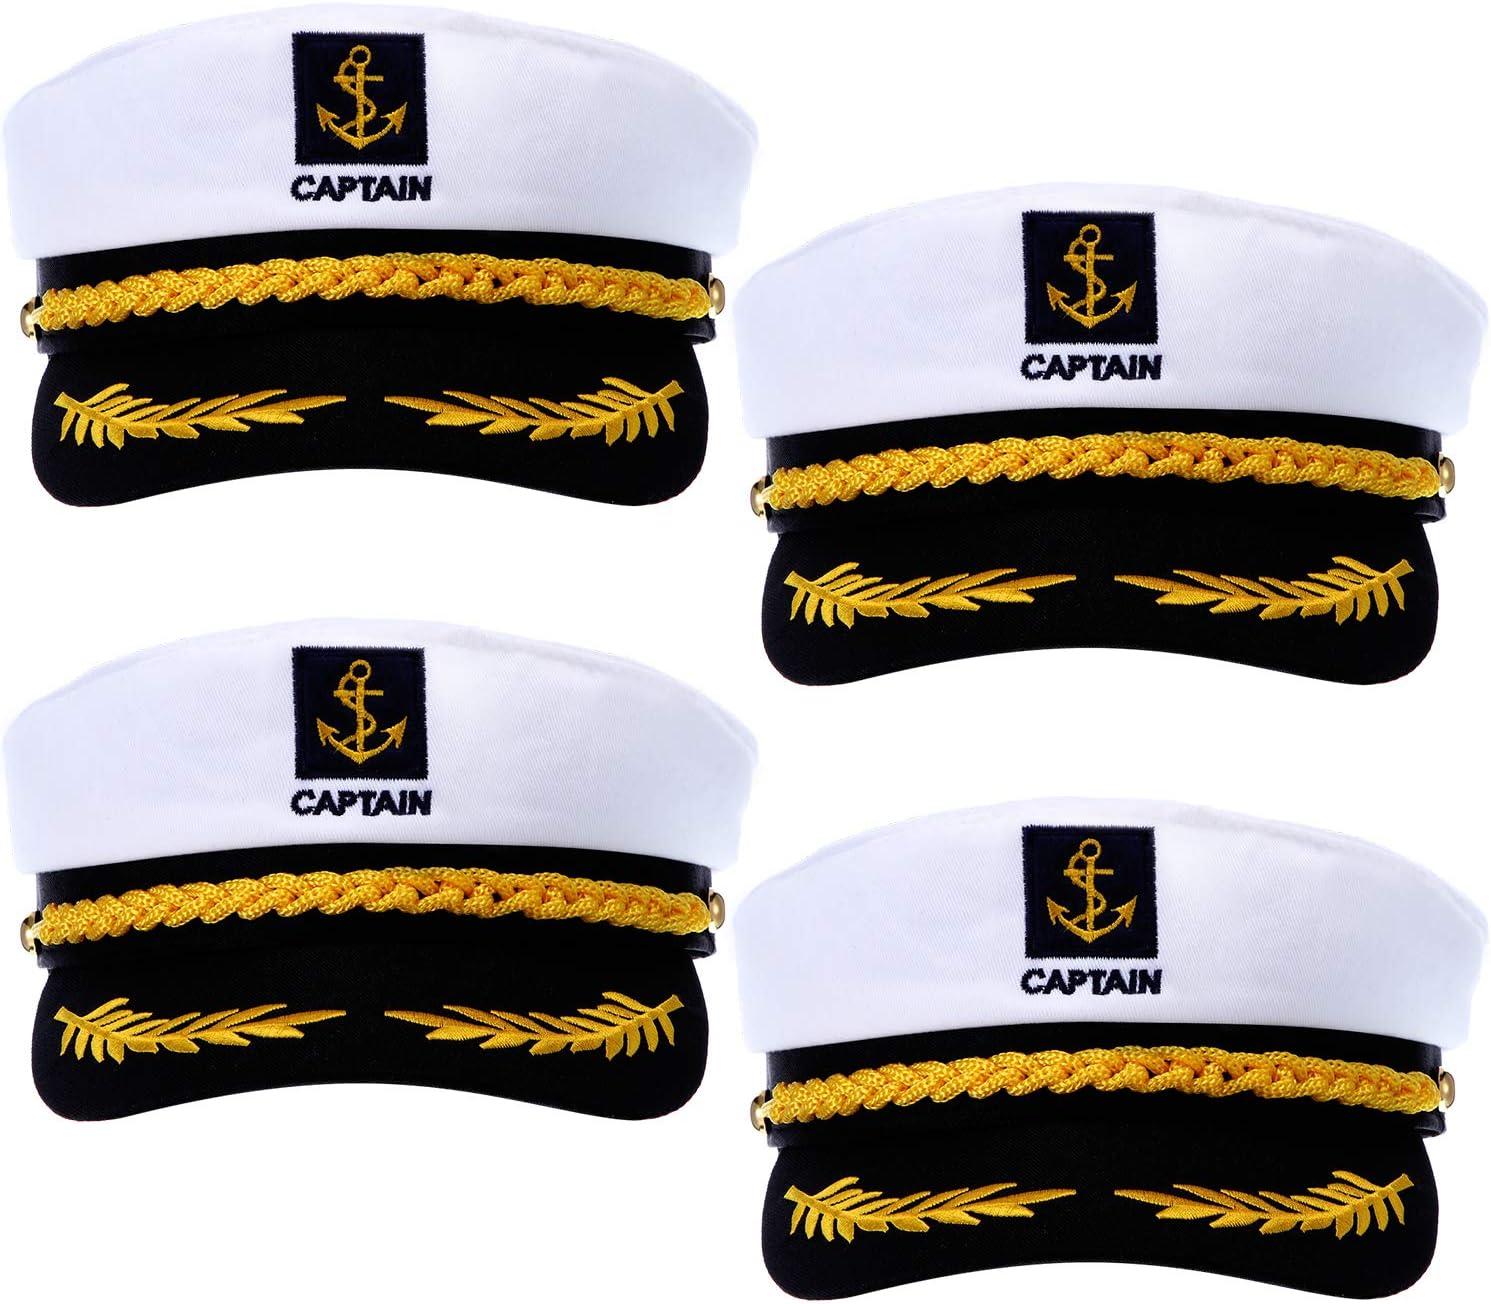 SATINIOR 4 Pieces Navy Marine Admiral Style Hat Adjustable Sailor Ship Cap Yacht Boat Captain hat for Men Women Costume Favor